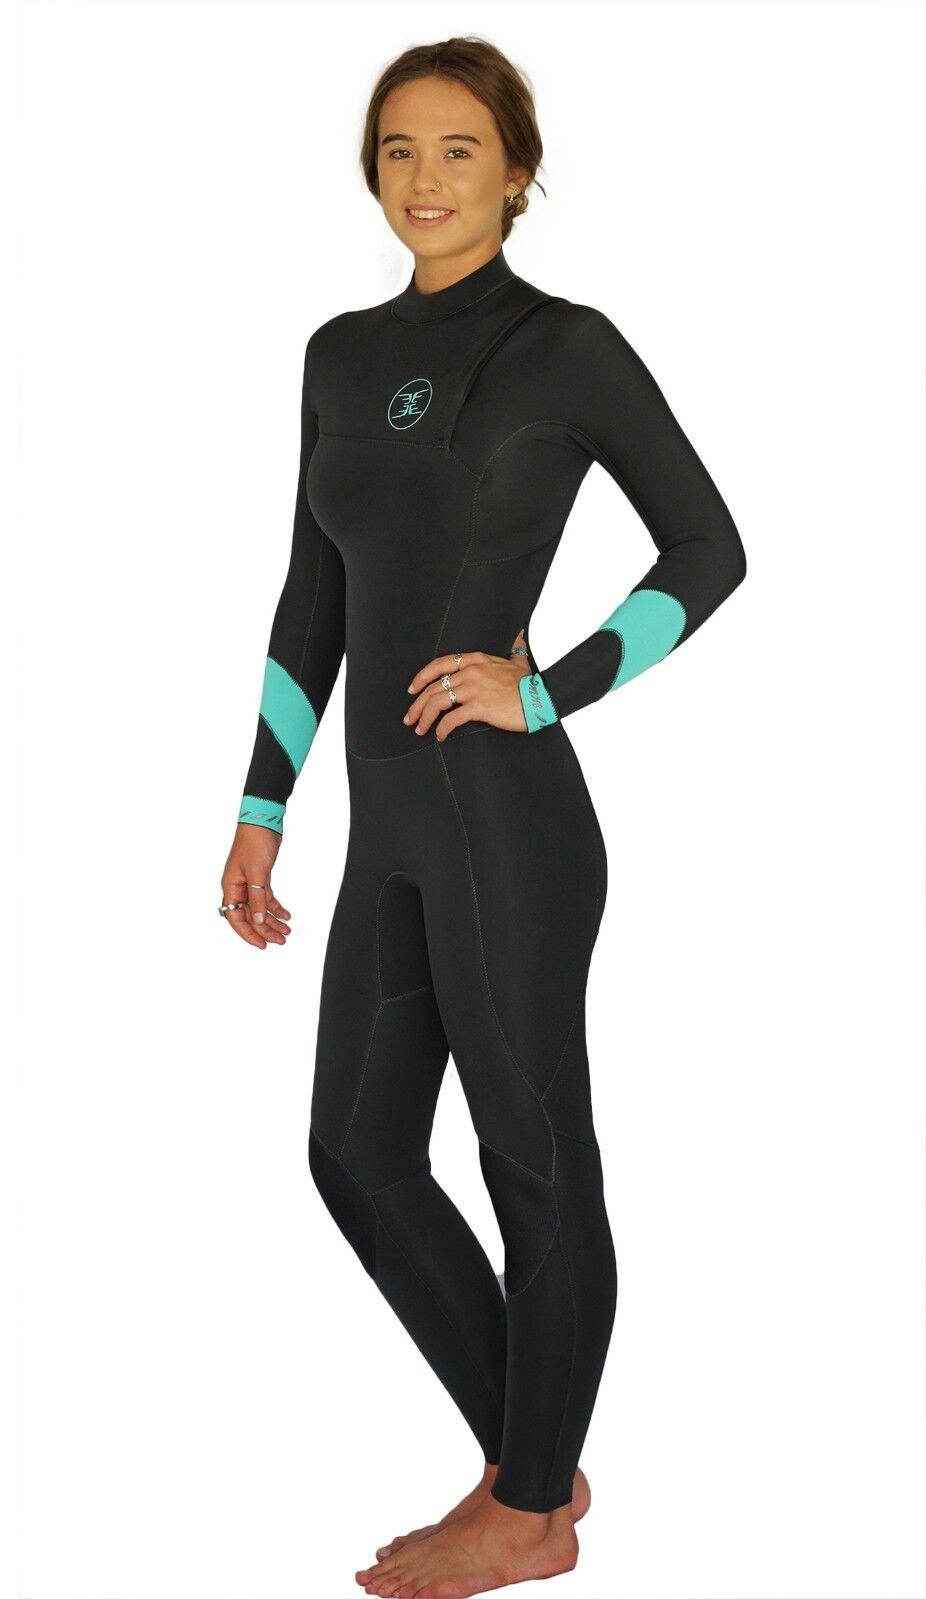 Ladies Wetsuit 3 2mm Zipperless Steamer  Ember  All Sizes 6, 8. 10 & 12